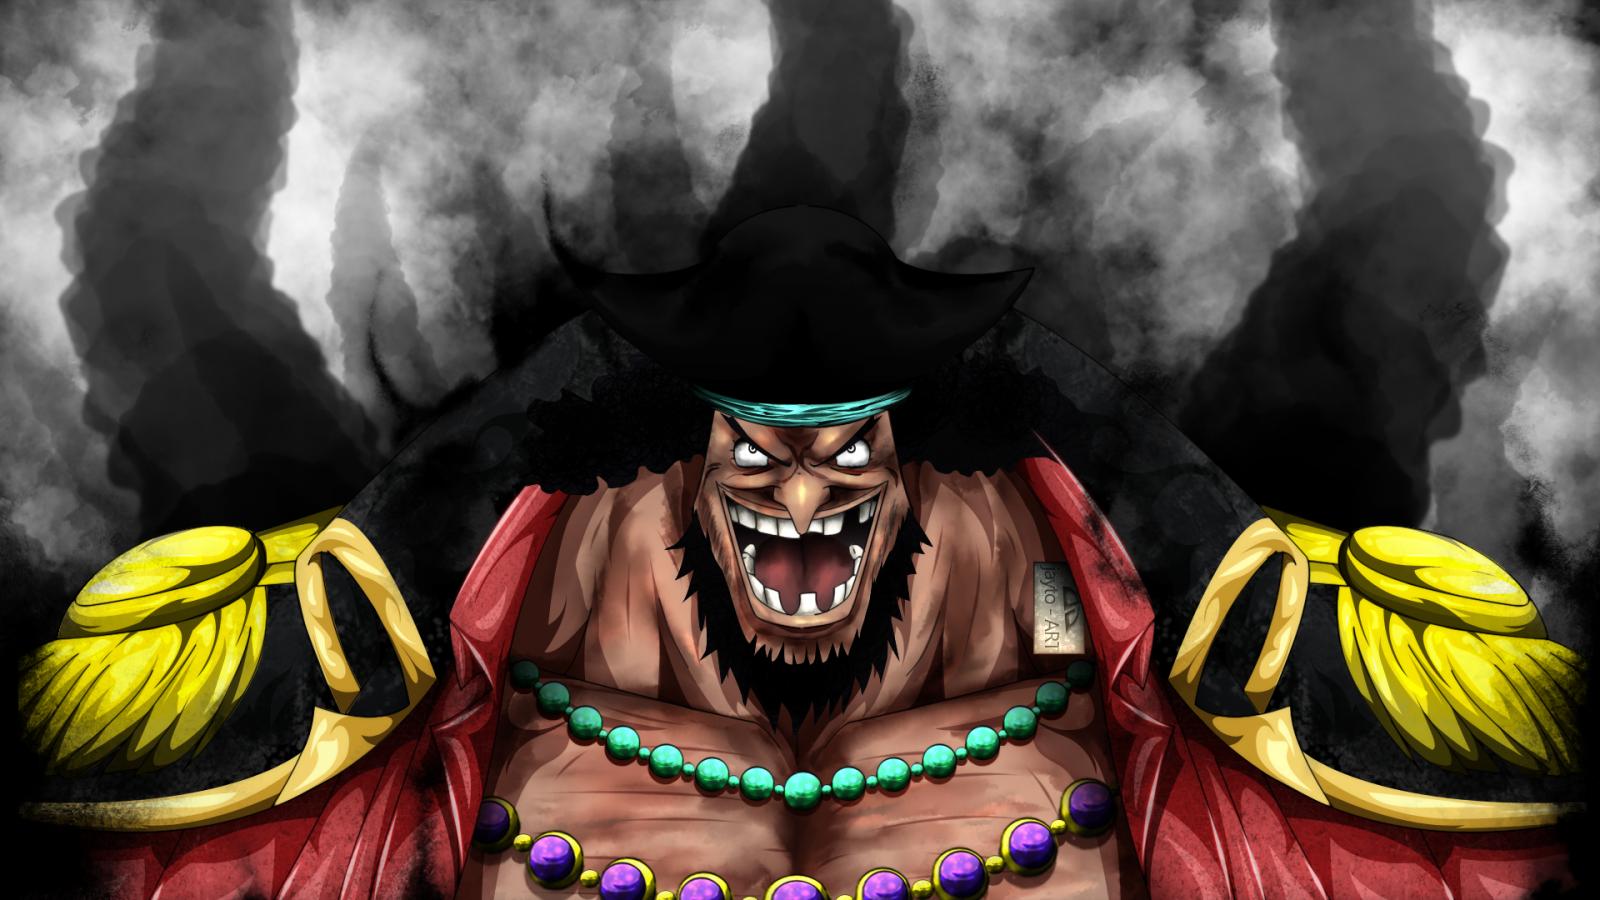 Wallpaper : anime, One Piece, blackbeard, marshall d teach 1920x1080 - saintroyo - 1390401 - HD ...